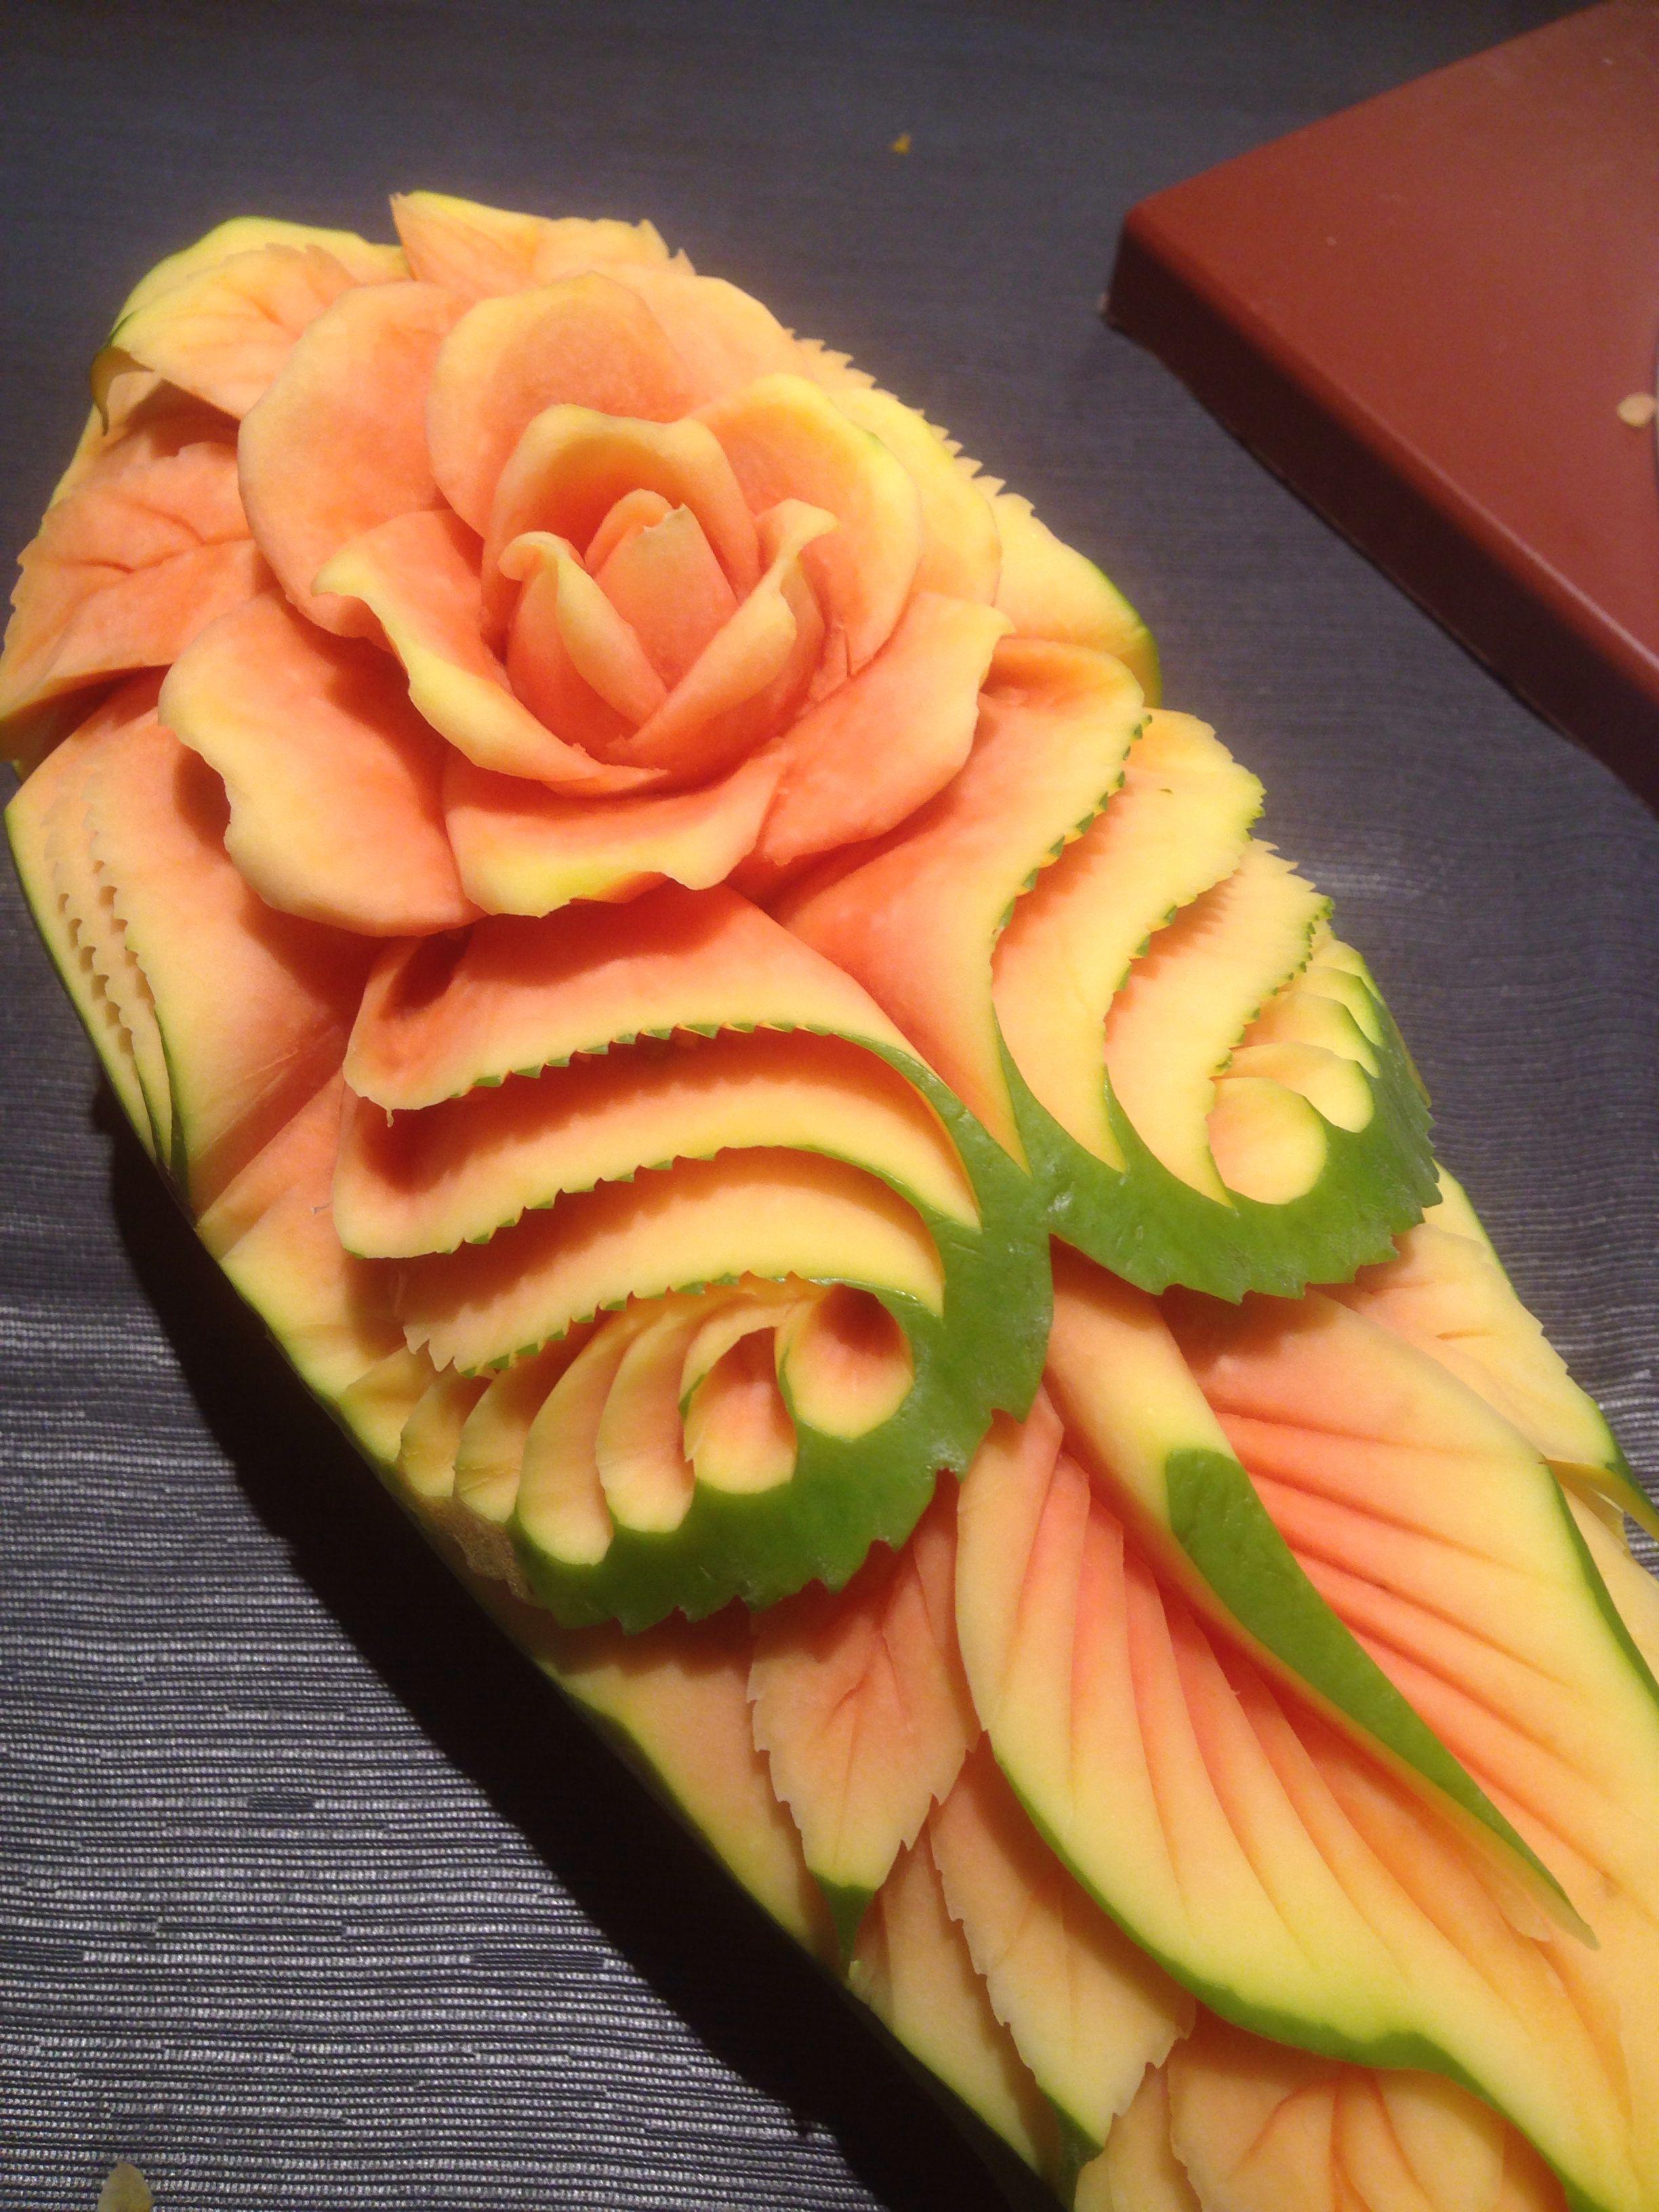 papaya carving food art pinterest essen ideen schnitzen und gem seschnitzen. Black Bedroom Furniture Sets. Home Design Ideas